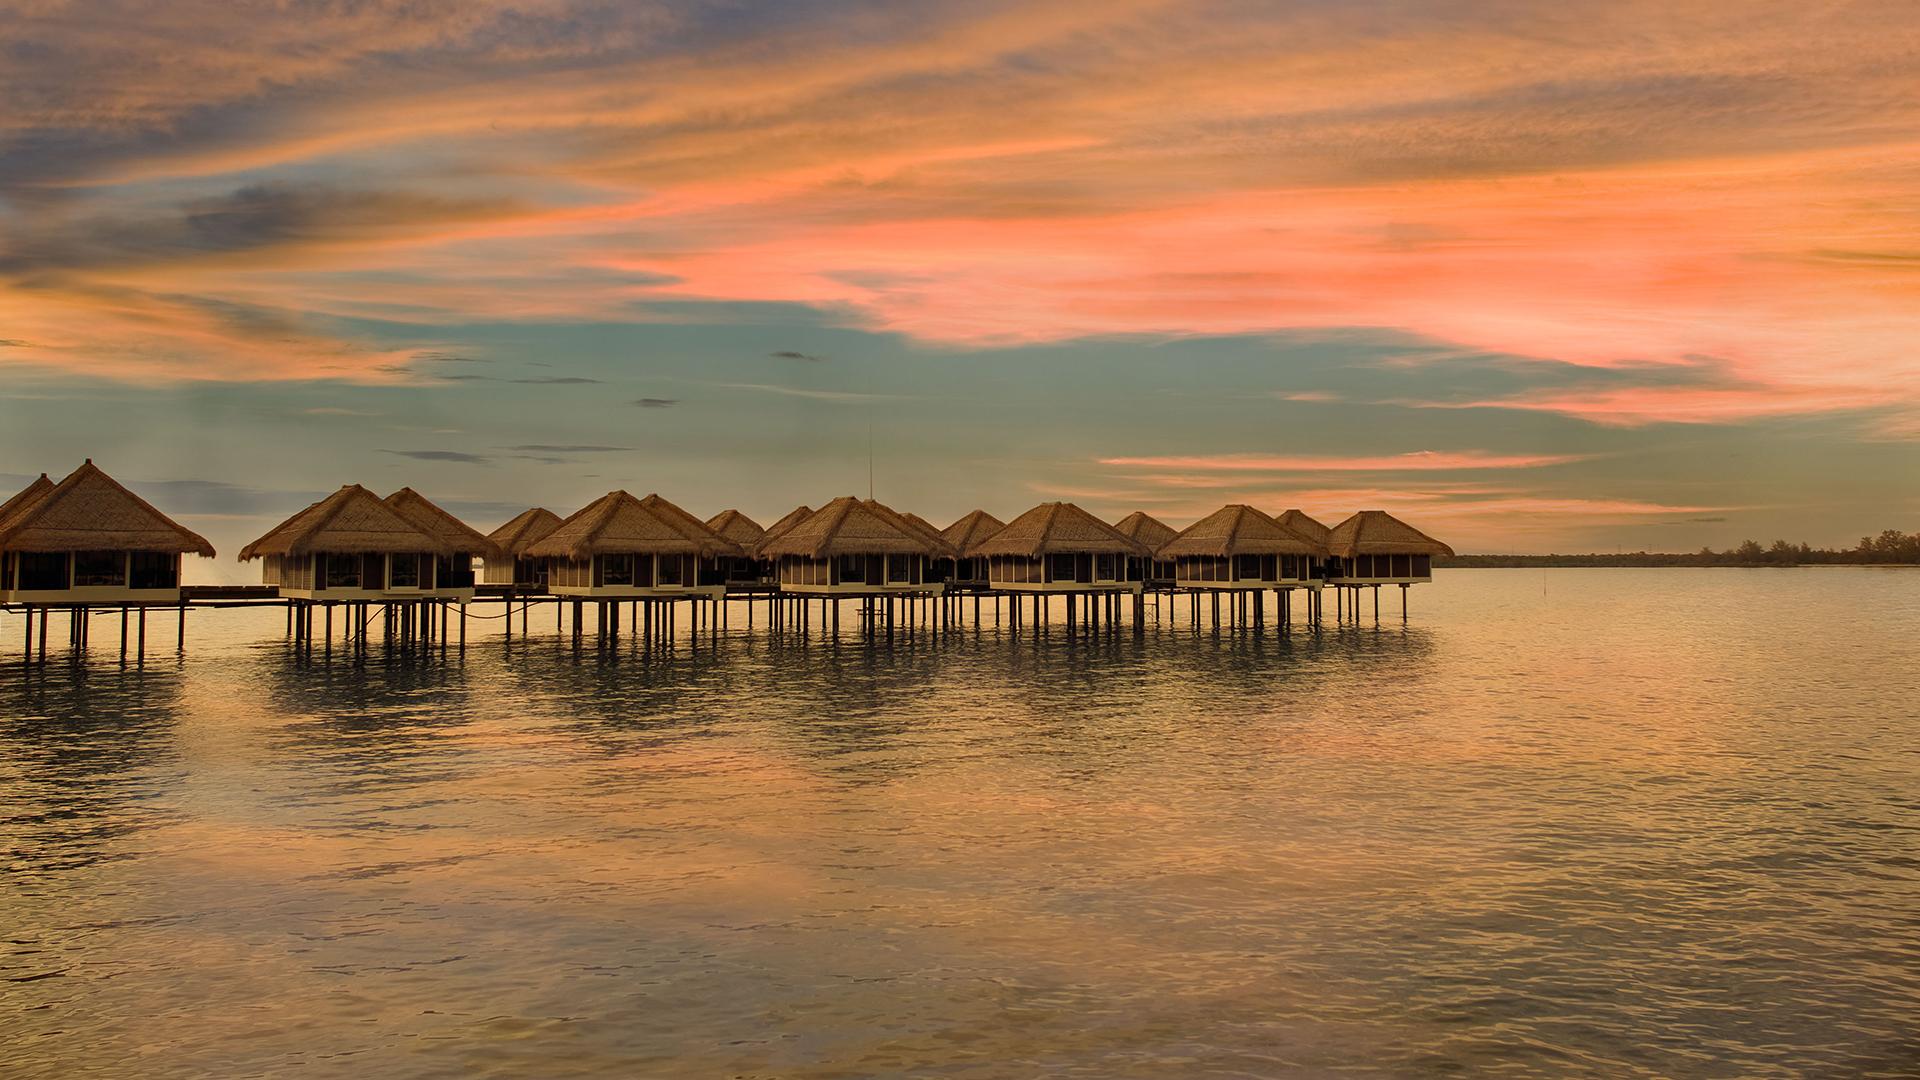 Beach_Avani Sepang Goldcoast